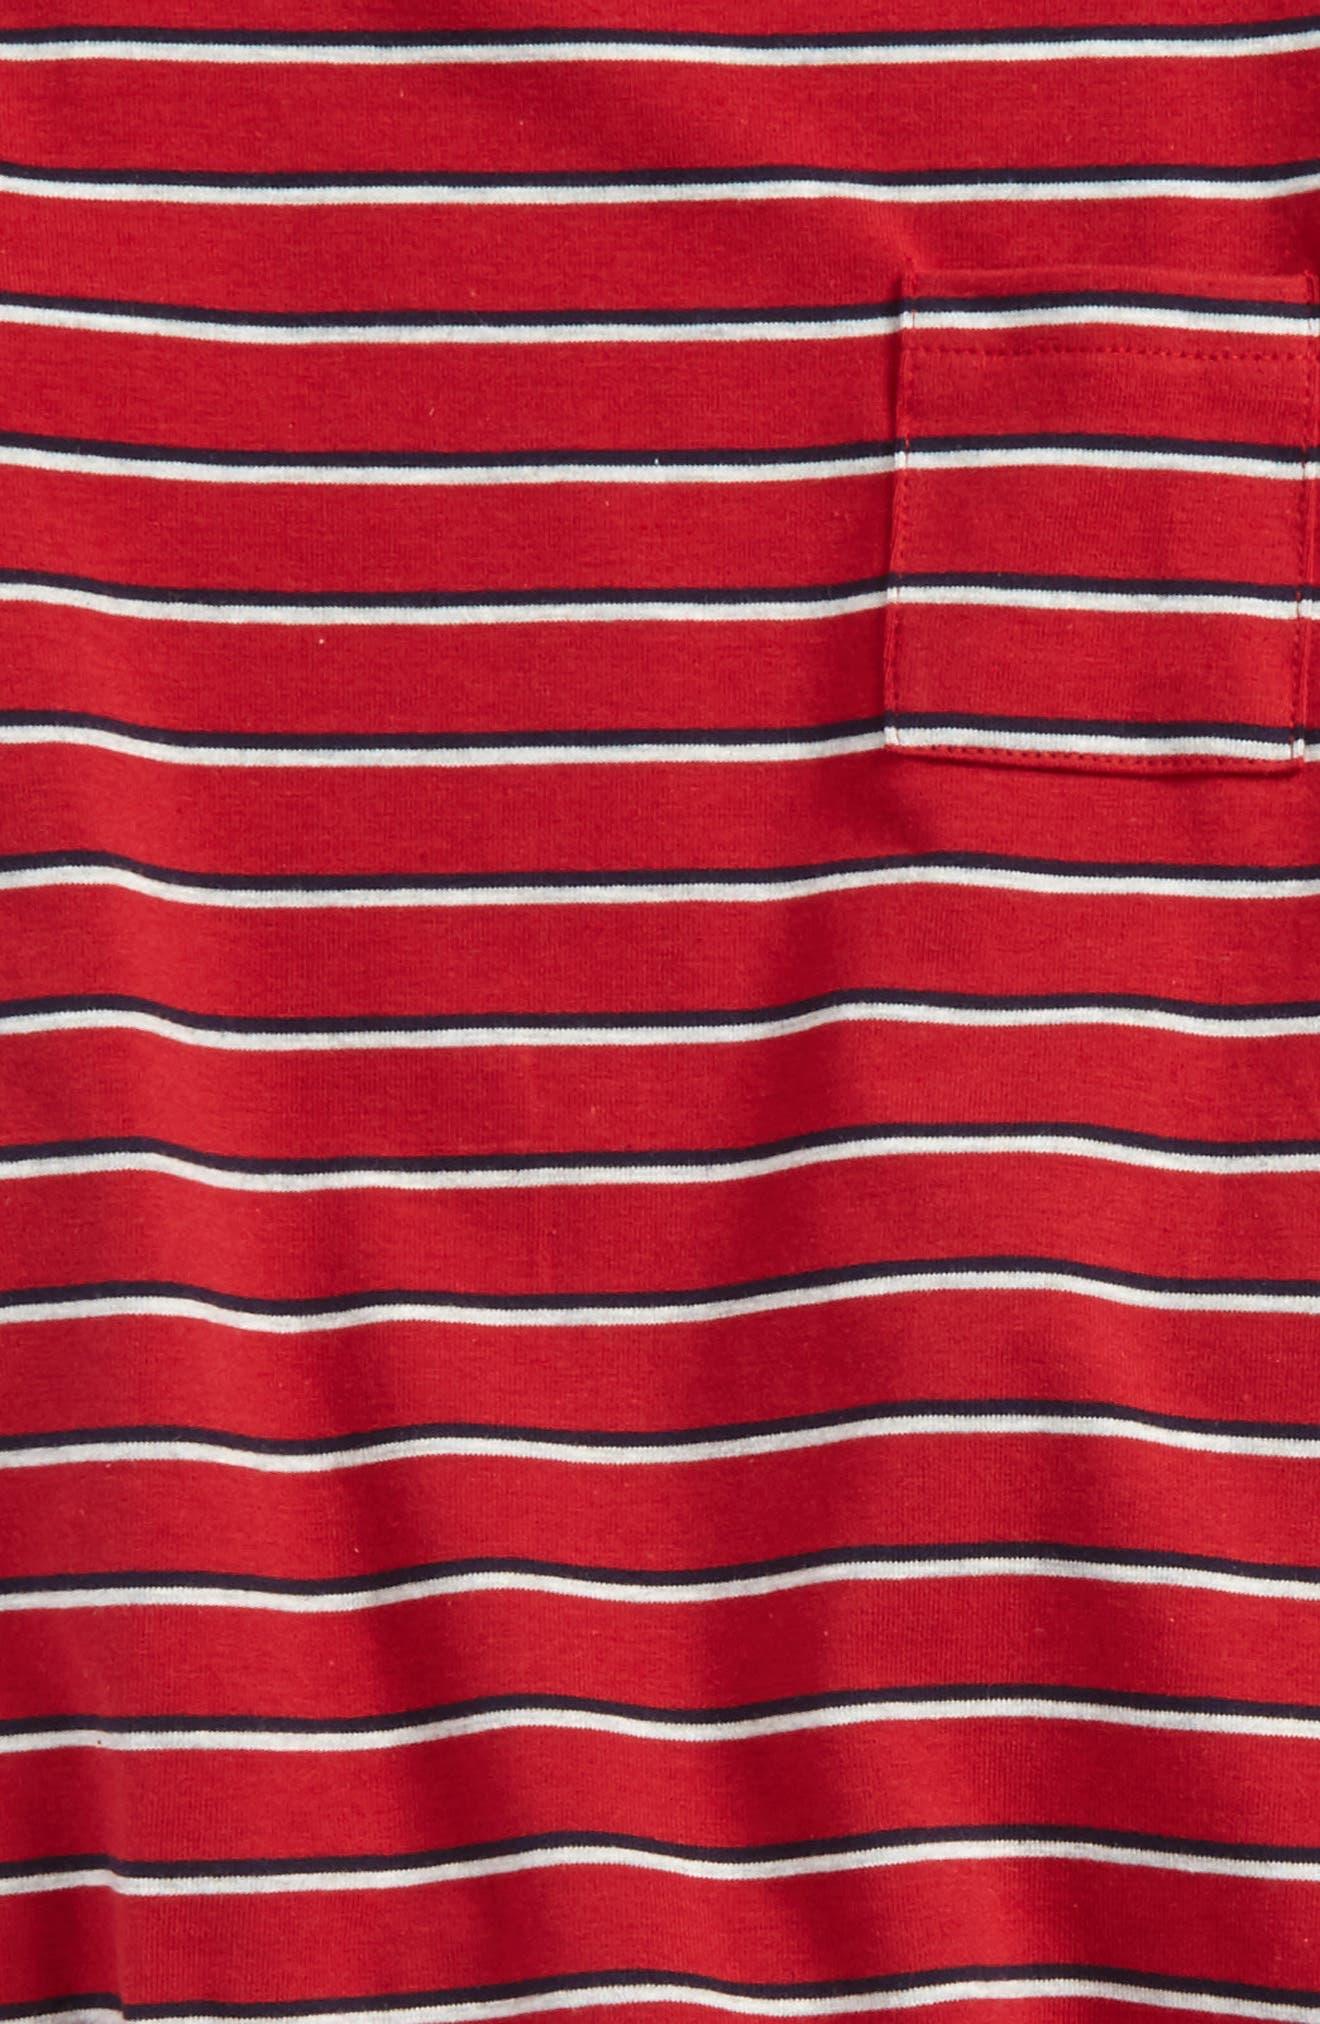 Stripe Shirt & Jeans Set,                             Alternate thumbnail 3, color,                             466